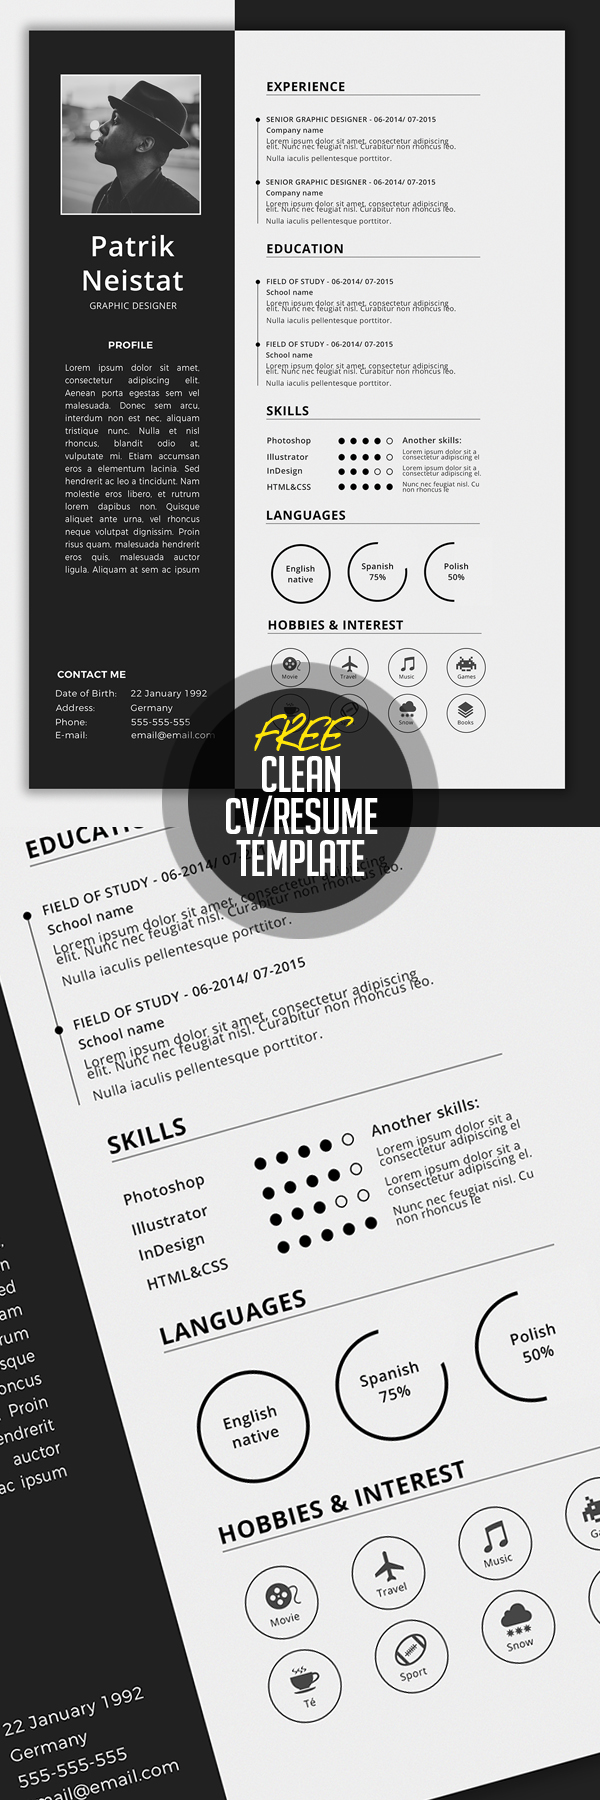 Simple CV/Resume Template Free Download